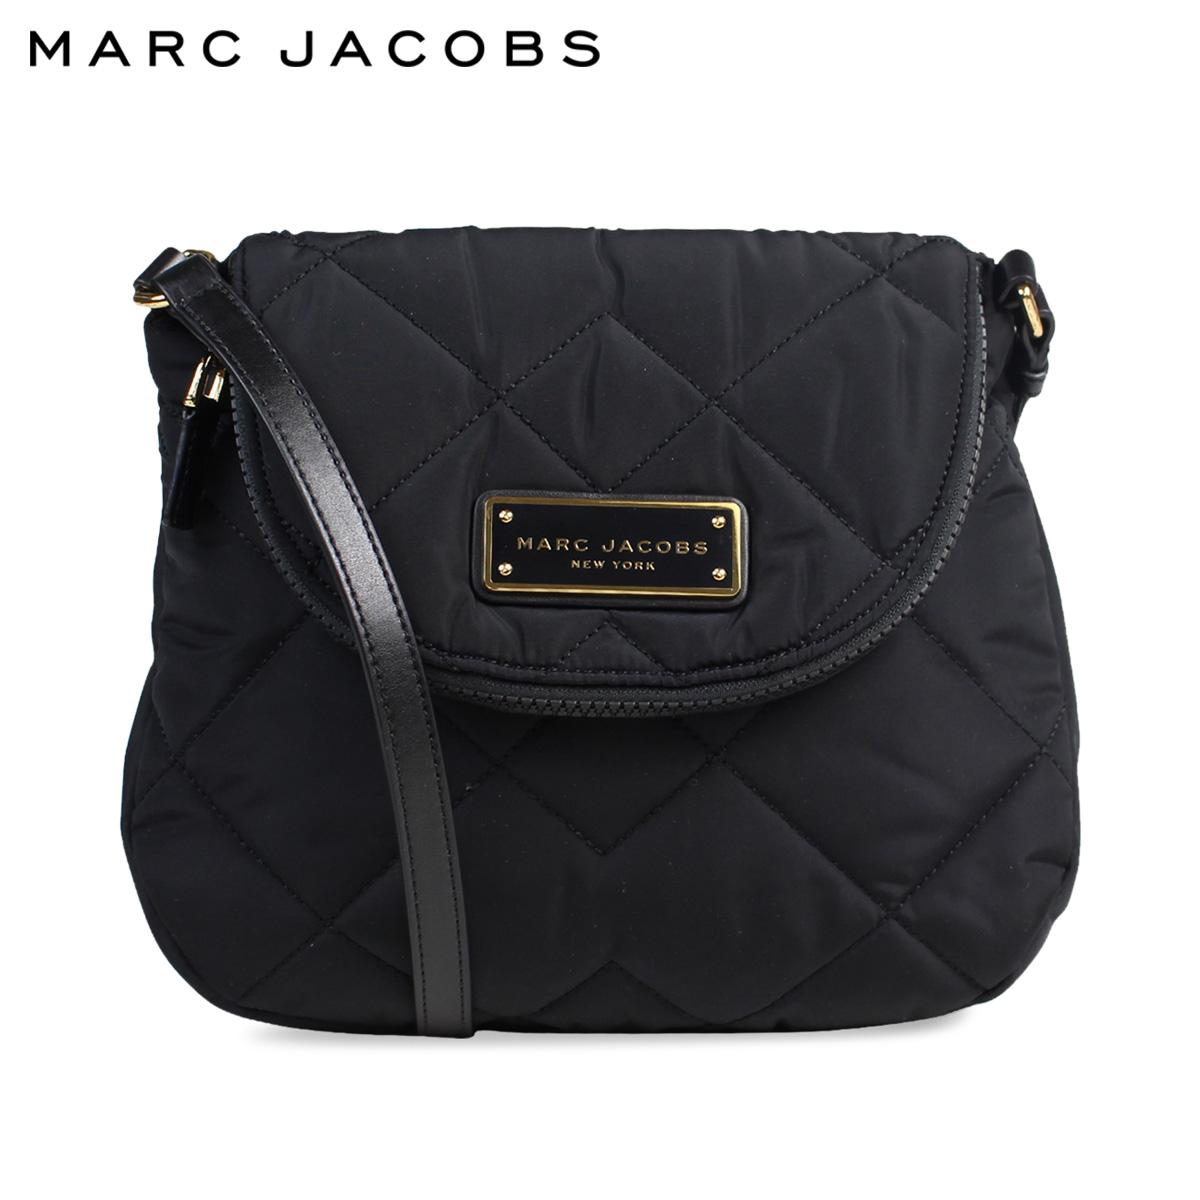 Mark Jacobs Marc Bag Shoulder Lady S Quilted Natasha Nylon Mini M0011379 Black 6 12 Shinnyu Load